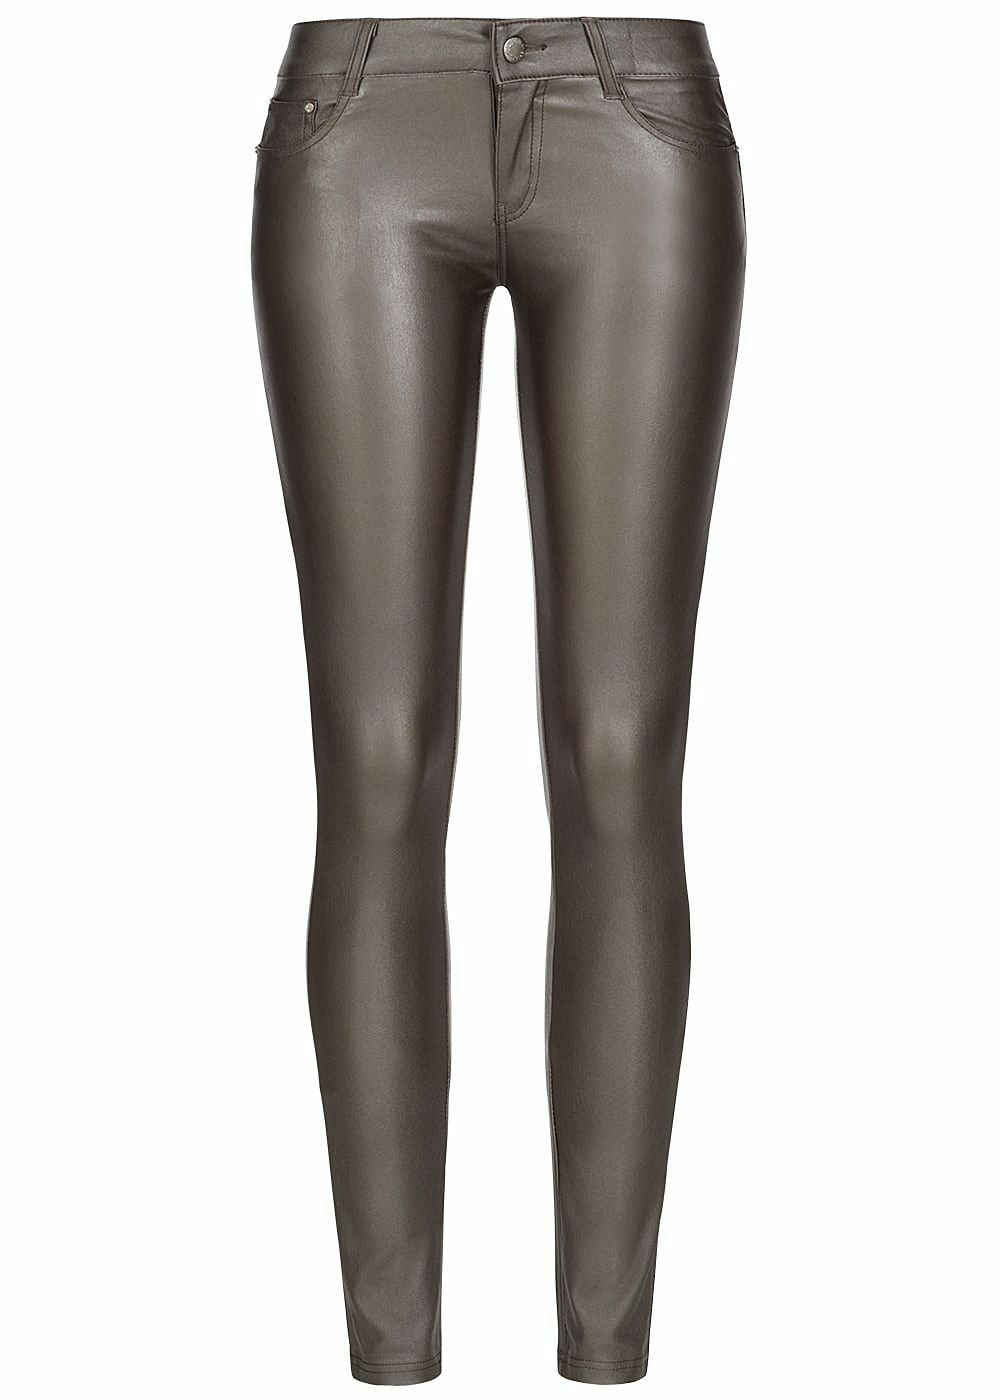 39% OFF B18083310 Damen 77 Lifestyle Hose Skinny Jeans Glanz Optik choco braun